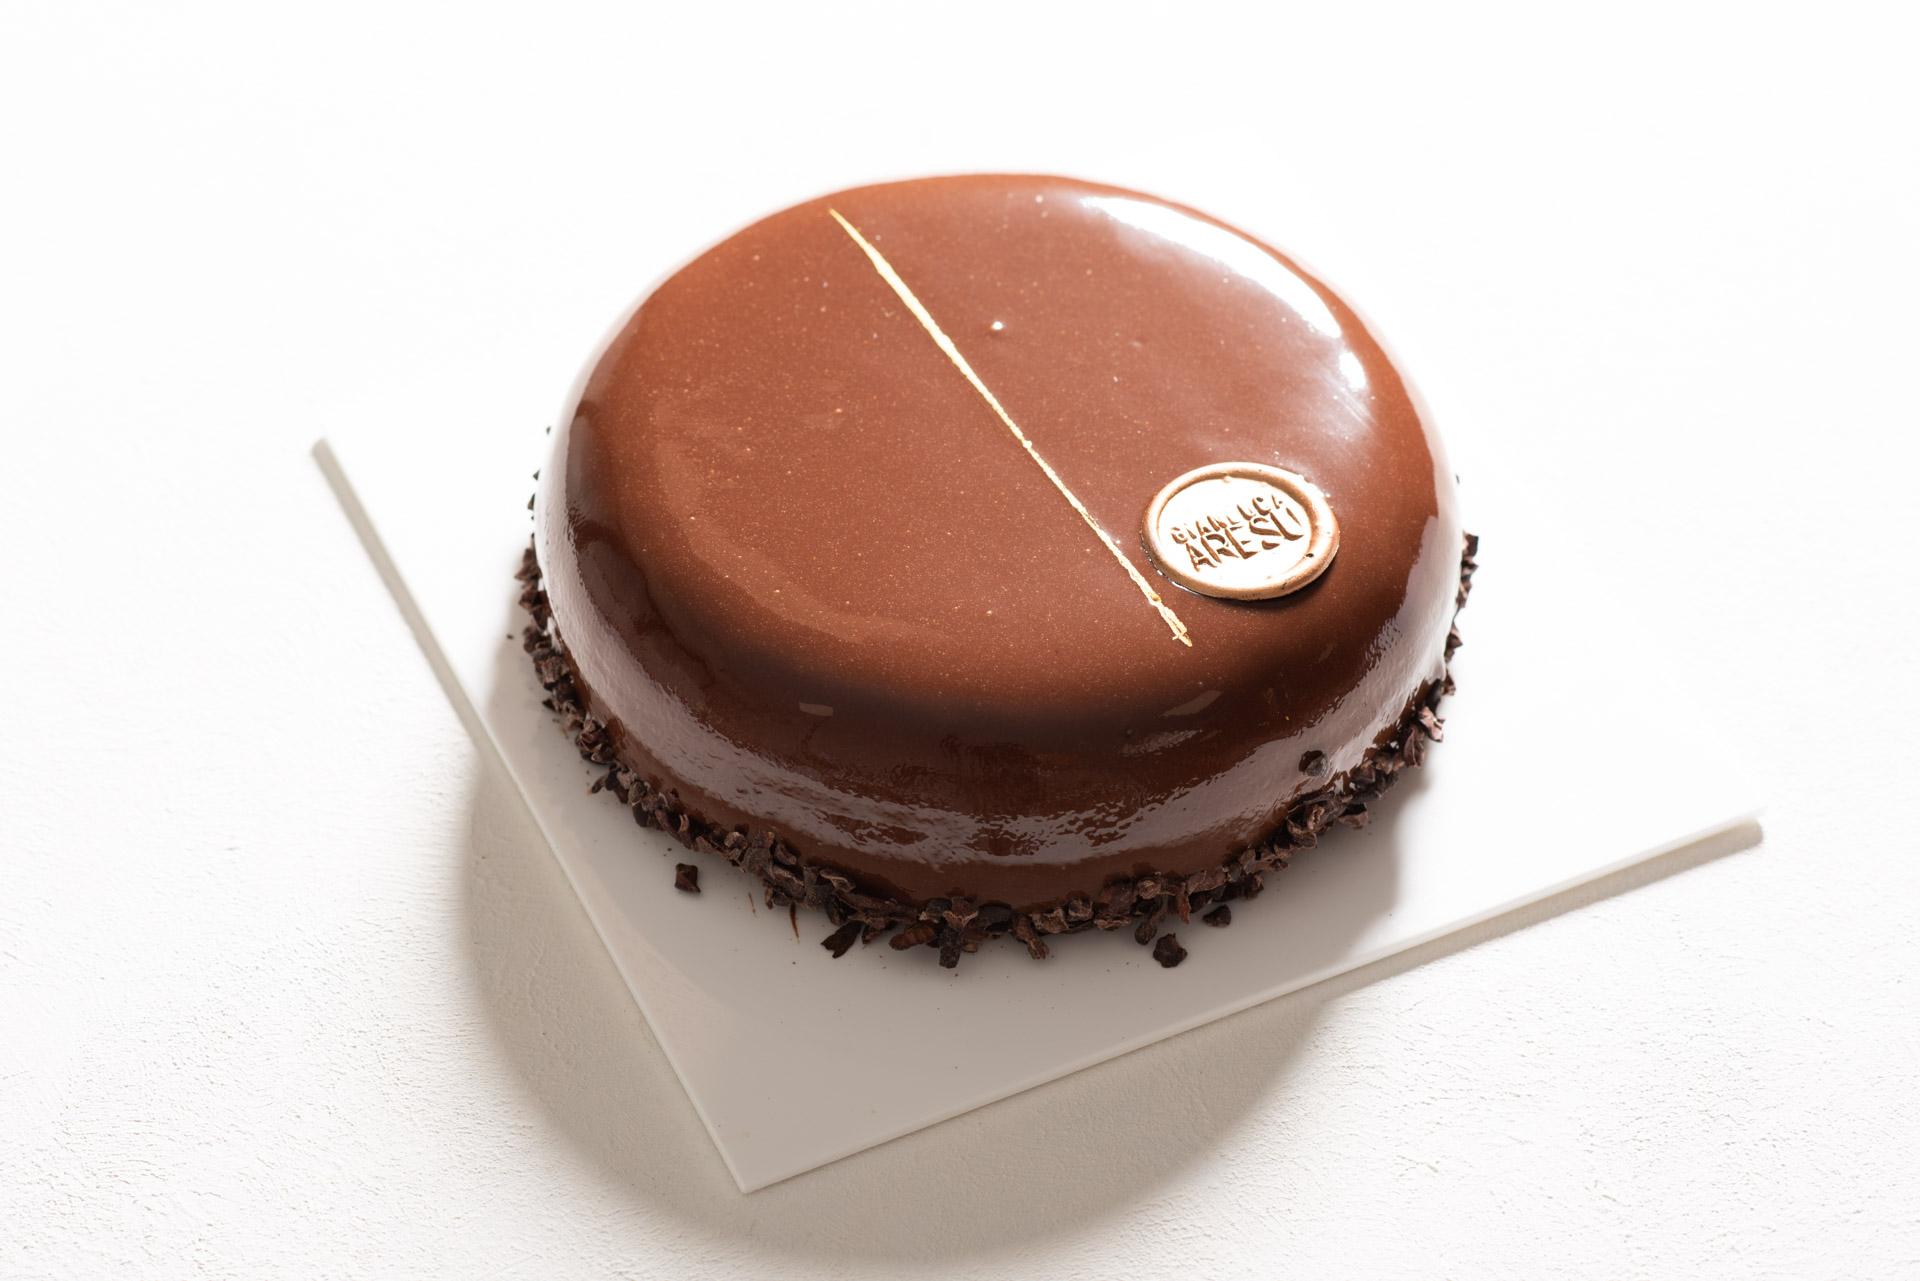 aresu dolce al cioccolato